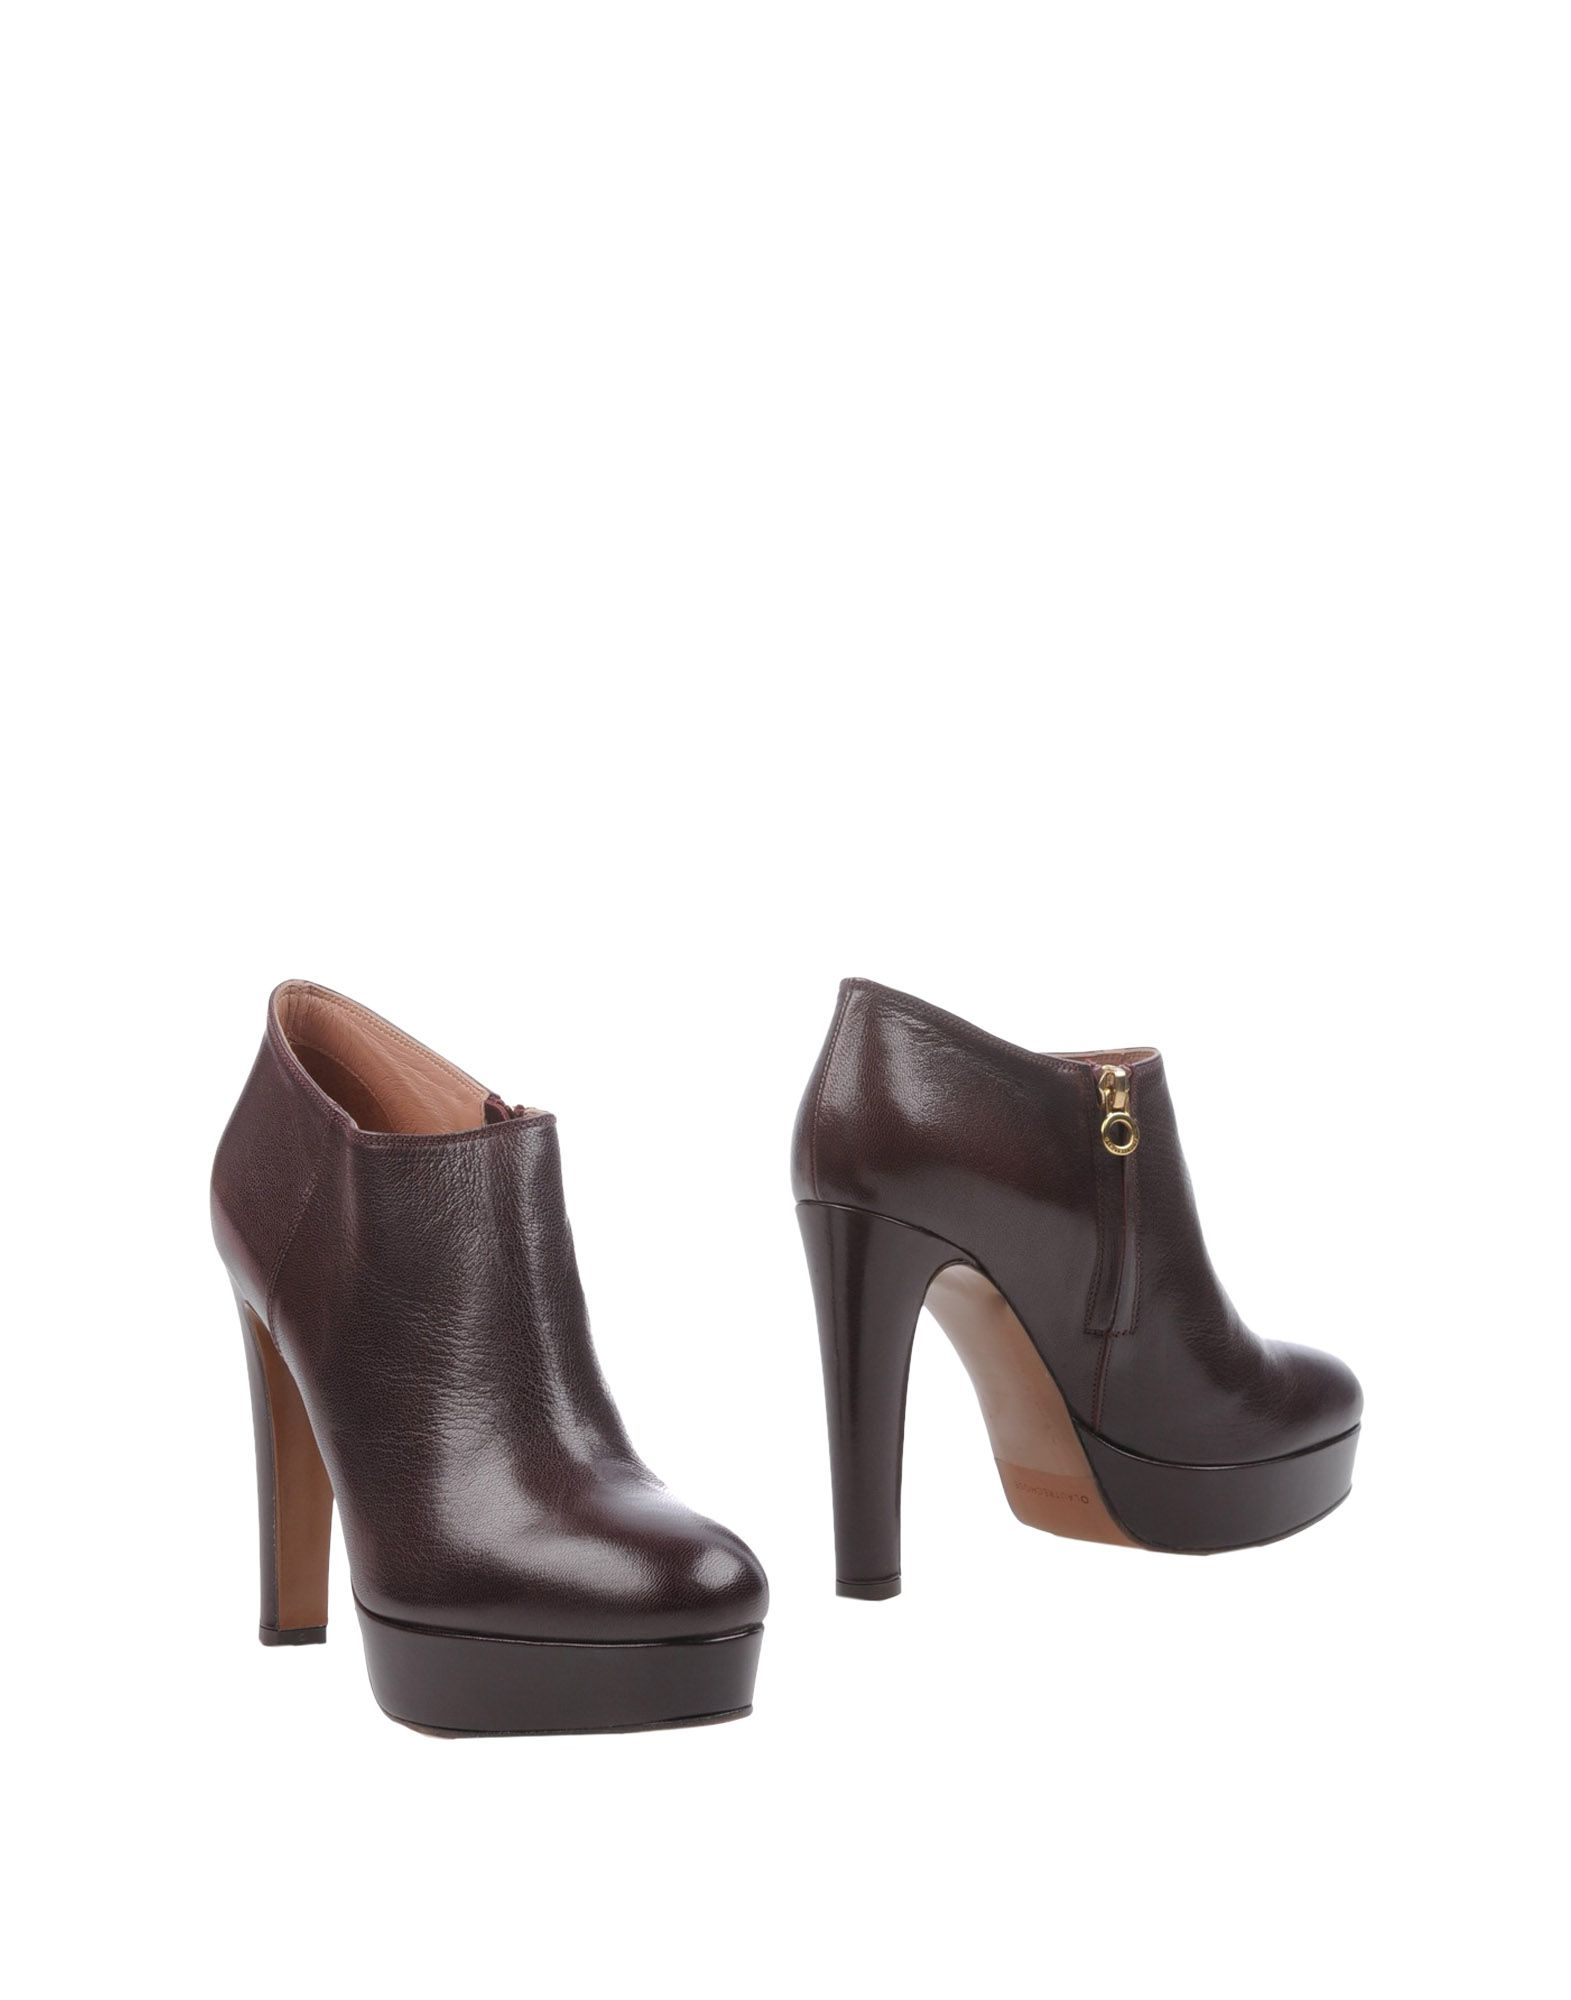 Rabatt Schuhe L' Autre 11226713BN Chose Stiefelette Damen  11226713BN Autre 4e07df